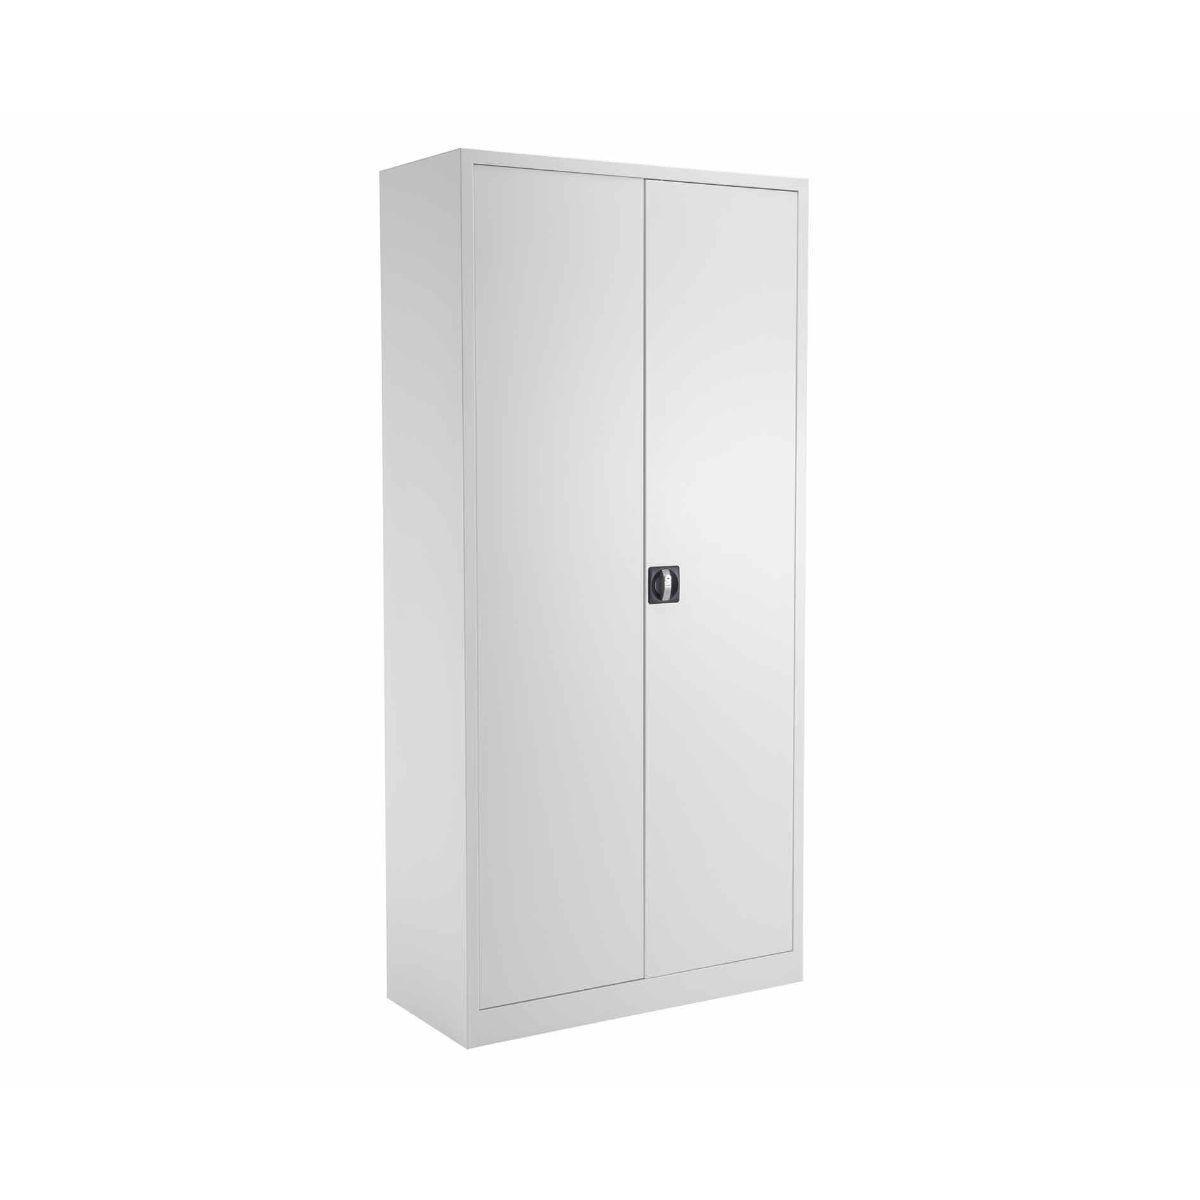 TC Office Talos Double Lockable Door Steel Cupboard with 4 Shelves 1950mm Height White